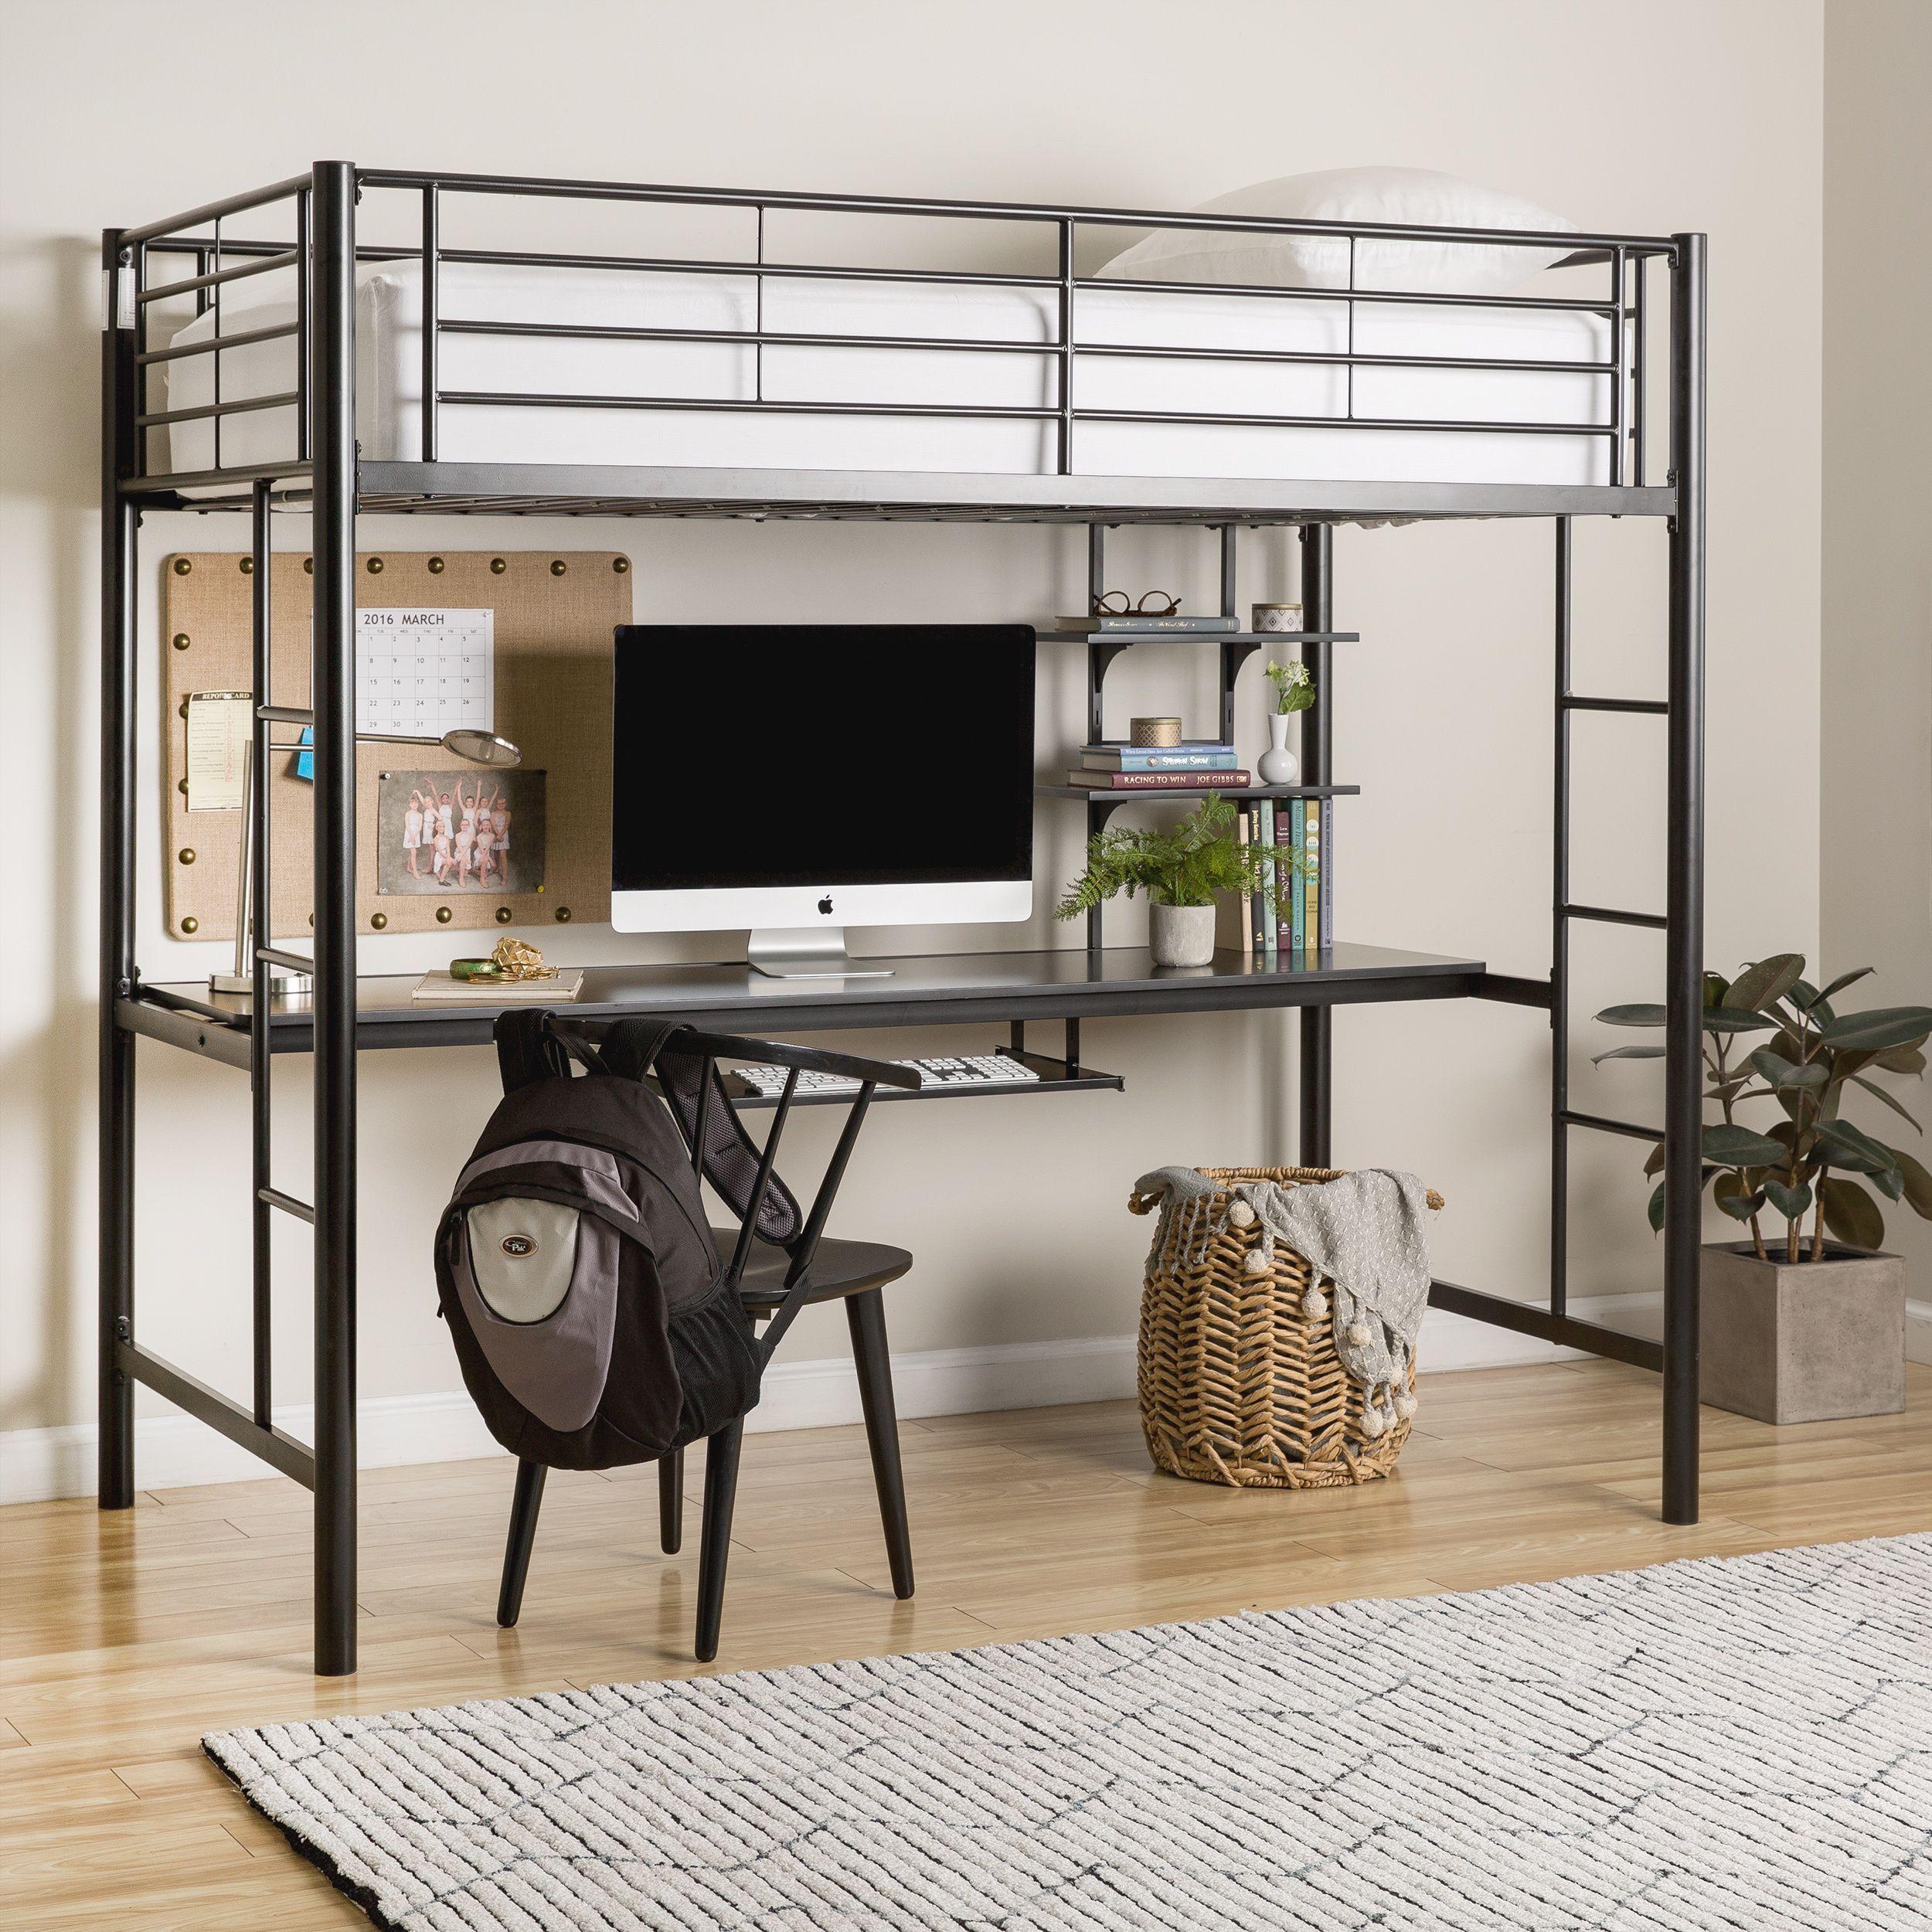 Twin loft bed ideas  Black Metal Twin Loft Bed with Desk in   Products  Pinterest